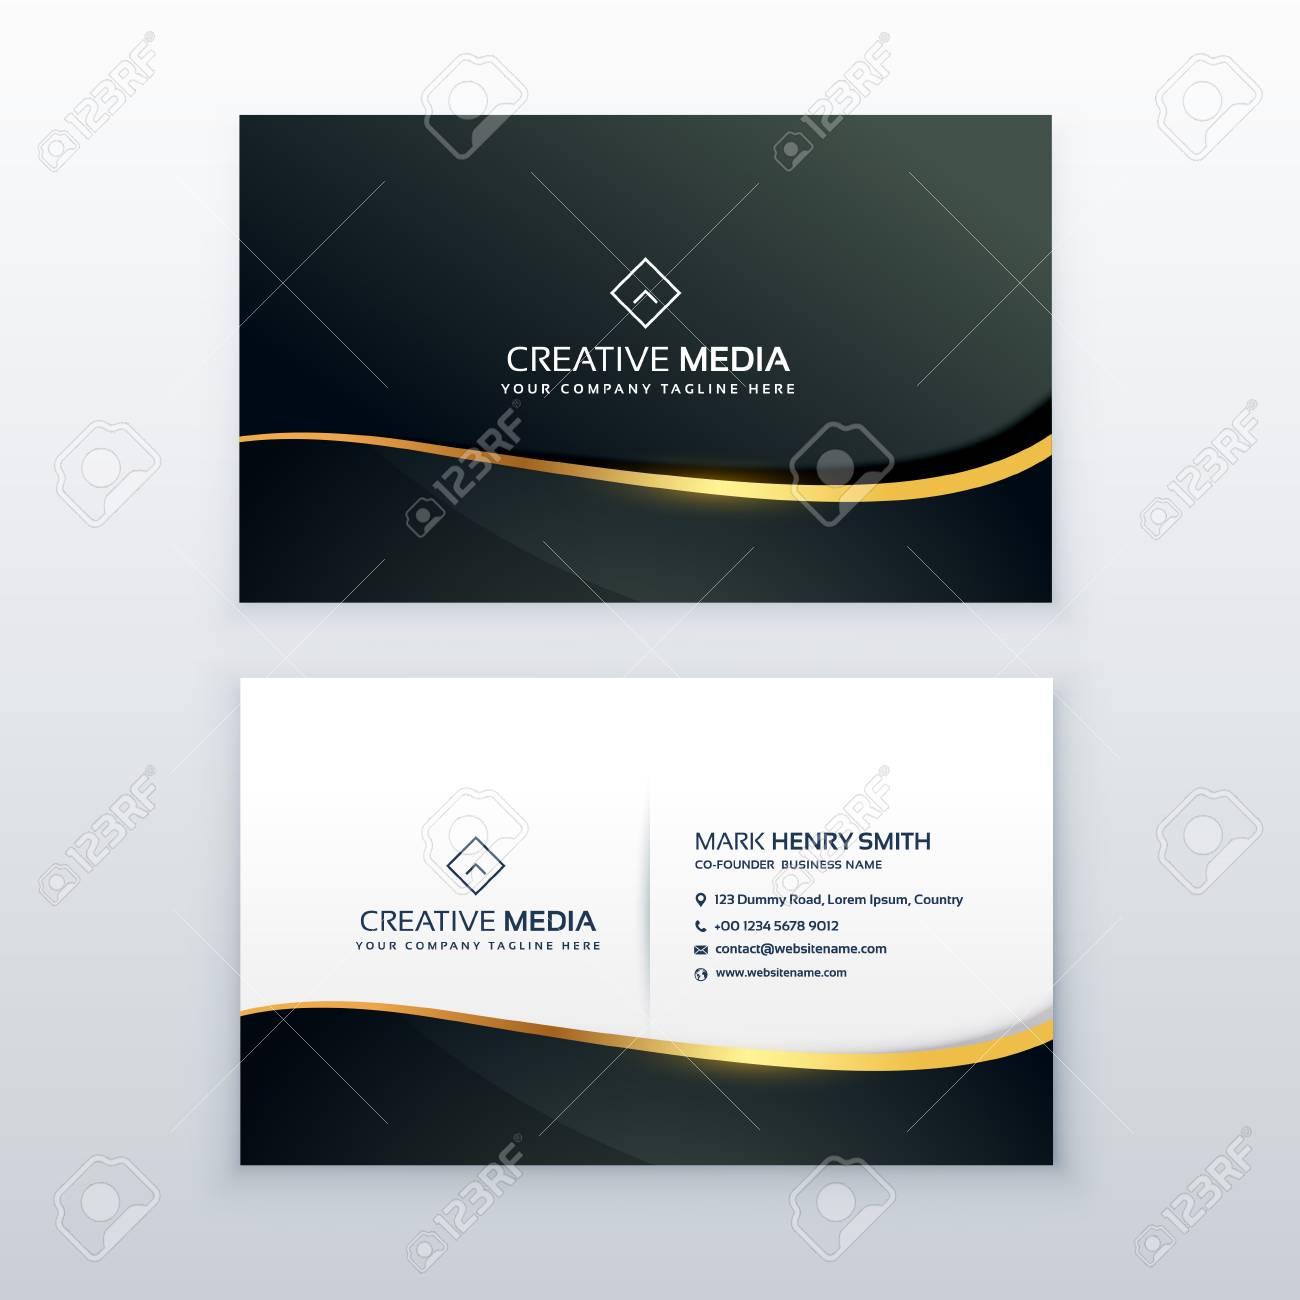 Premium Business Card Design Template Royalty Free Cliparts, Vectors ...